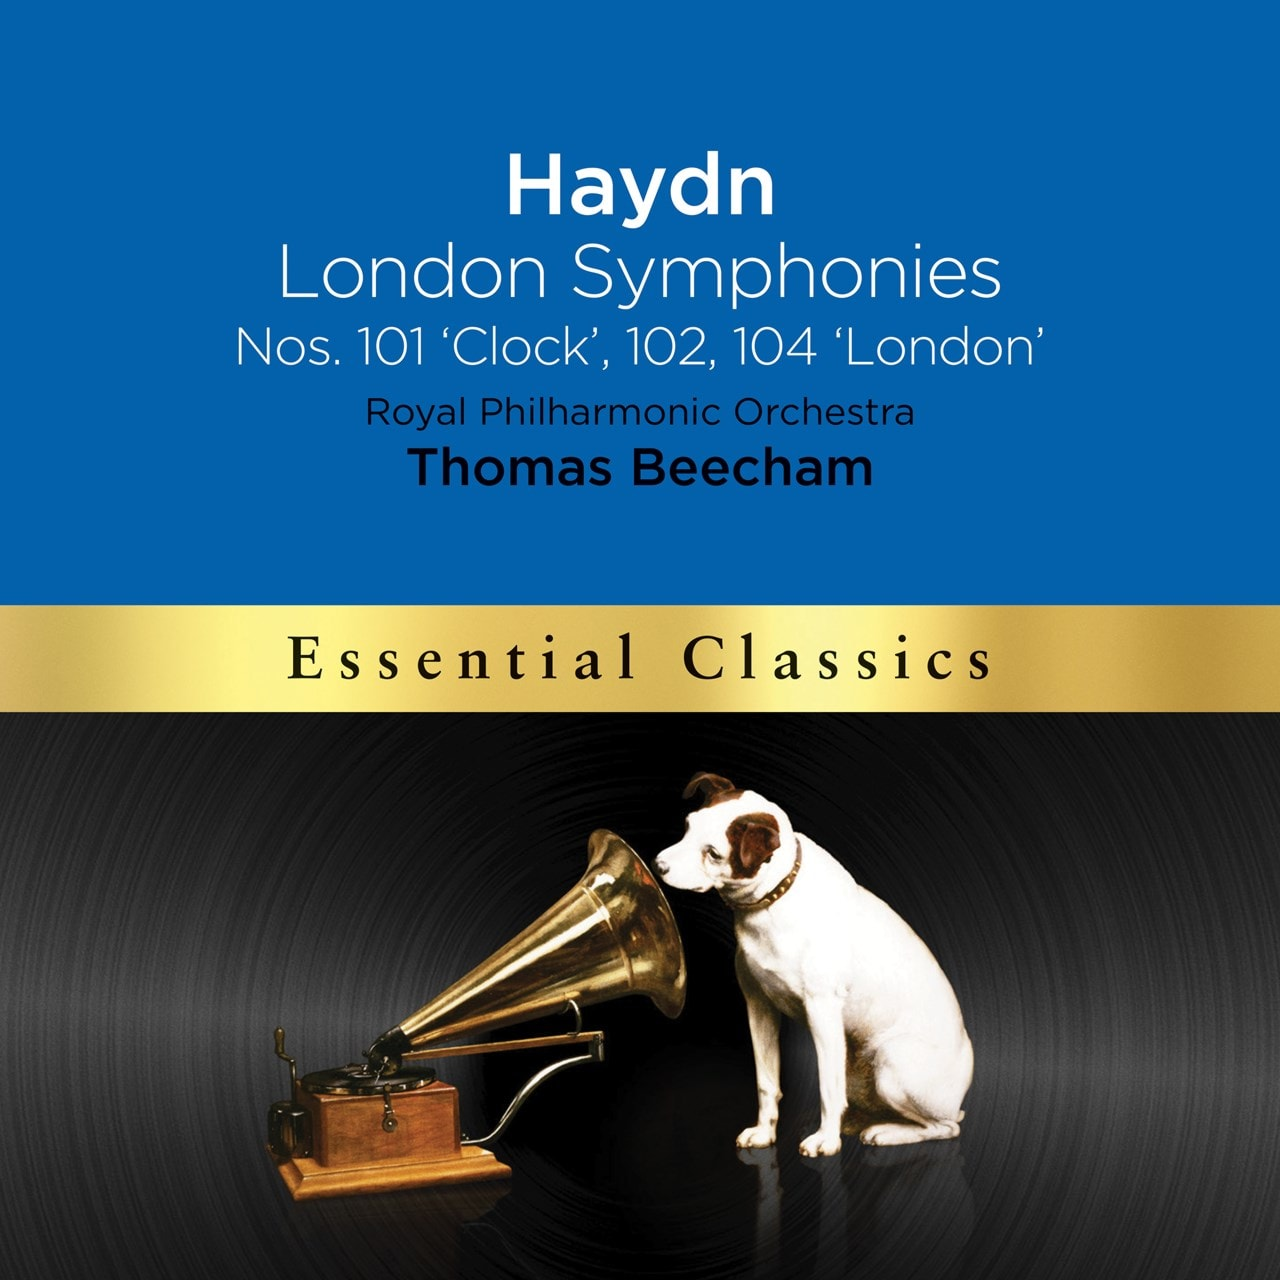 Haydn: London Symphonies Nos. 101 'Clock', 102, 104 'London' - 1